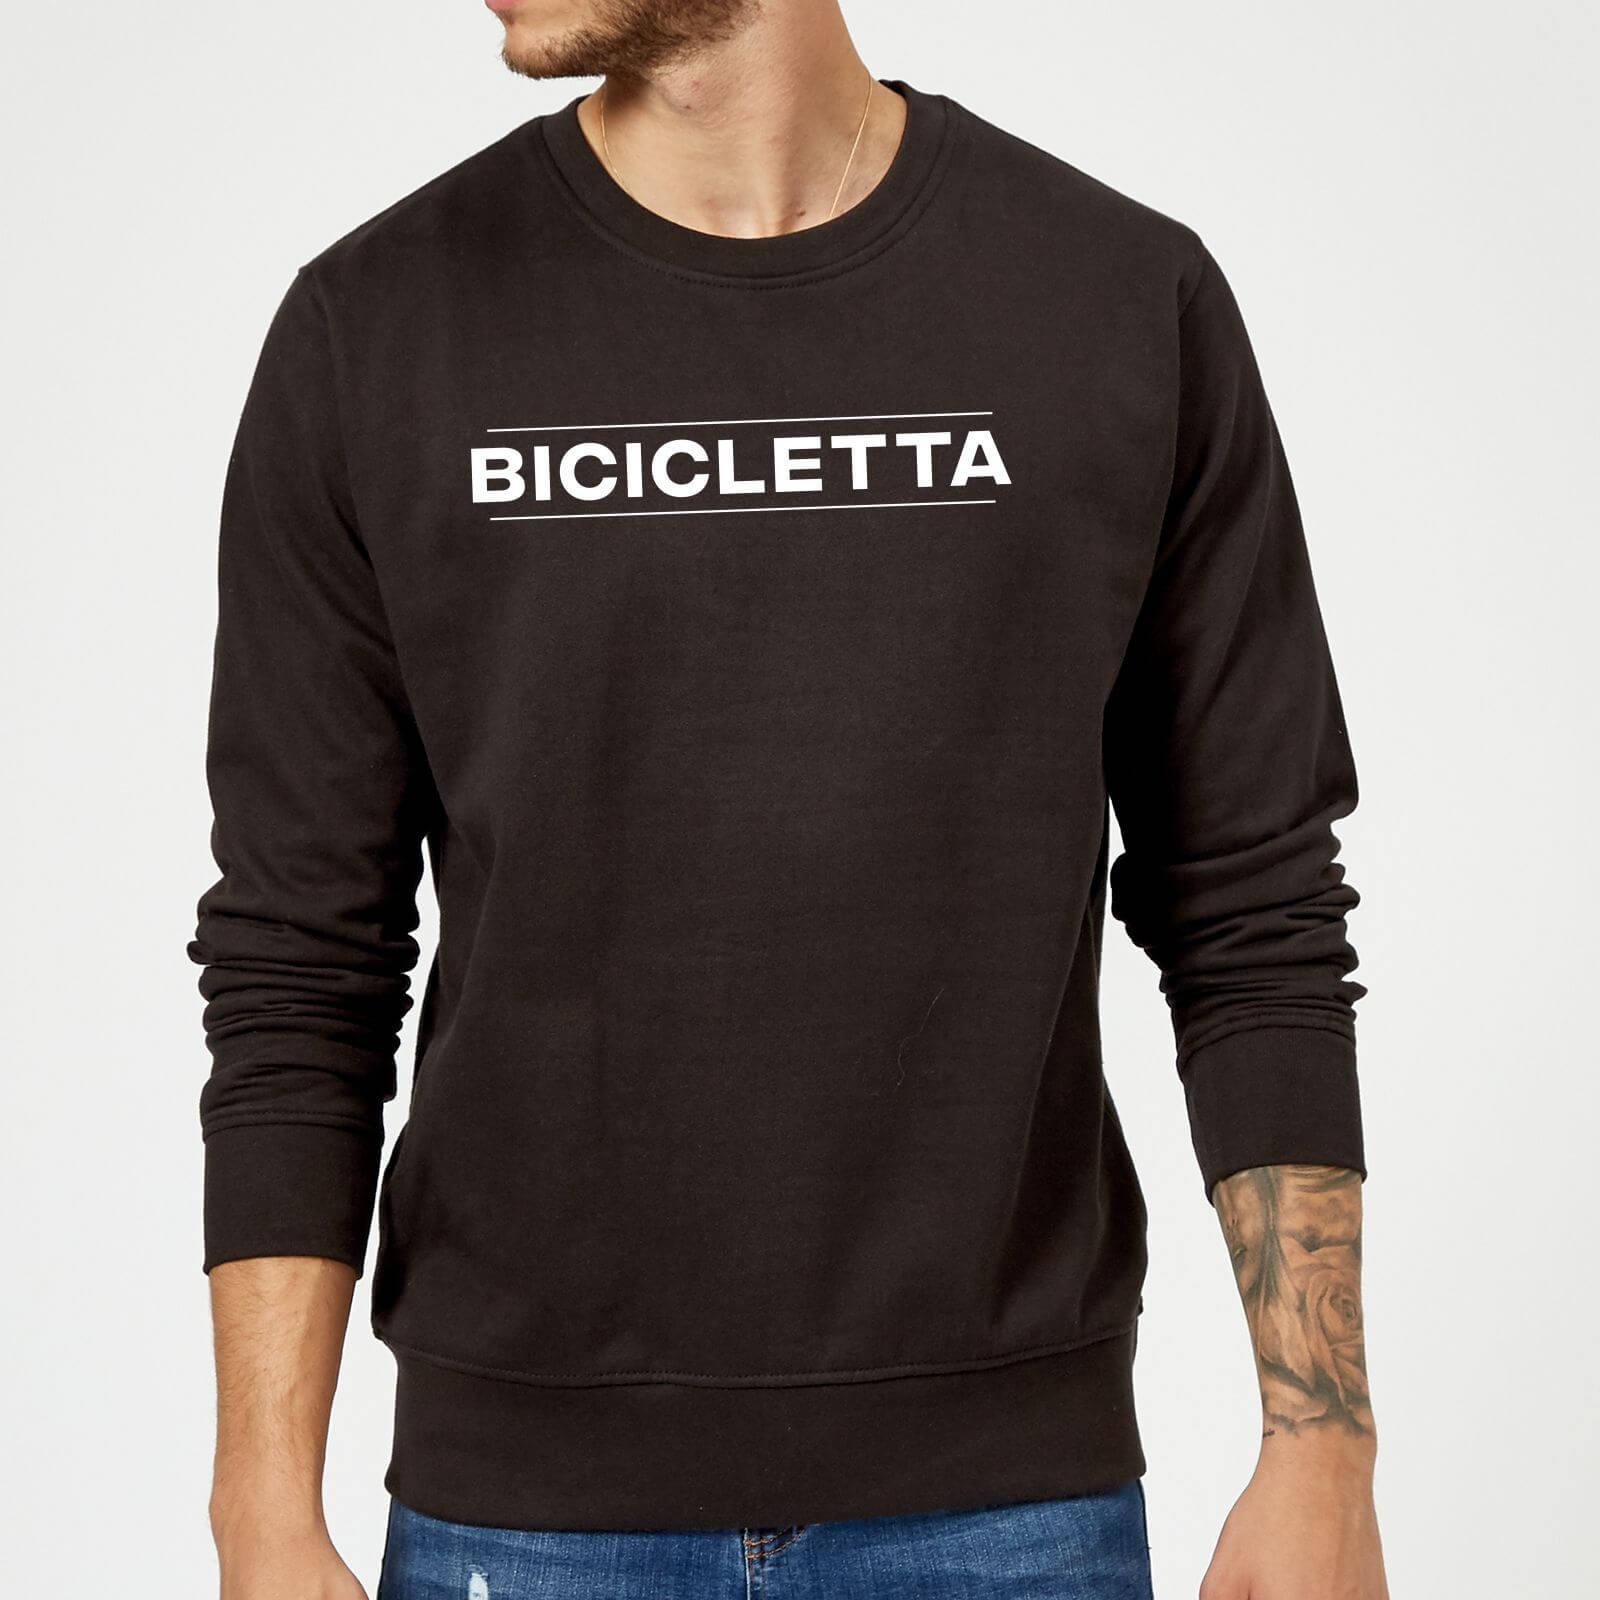 Bicicletta Sweatshirt - M - Grey